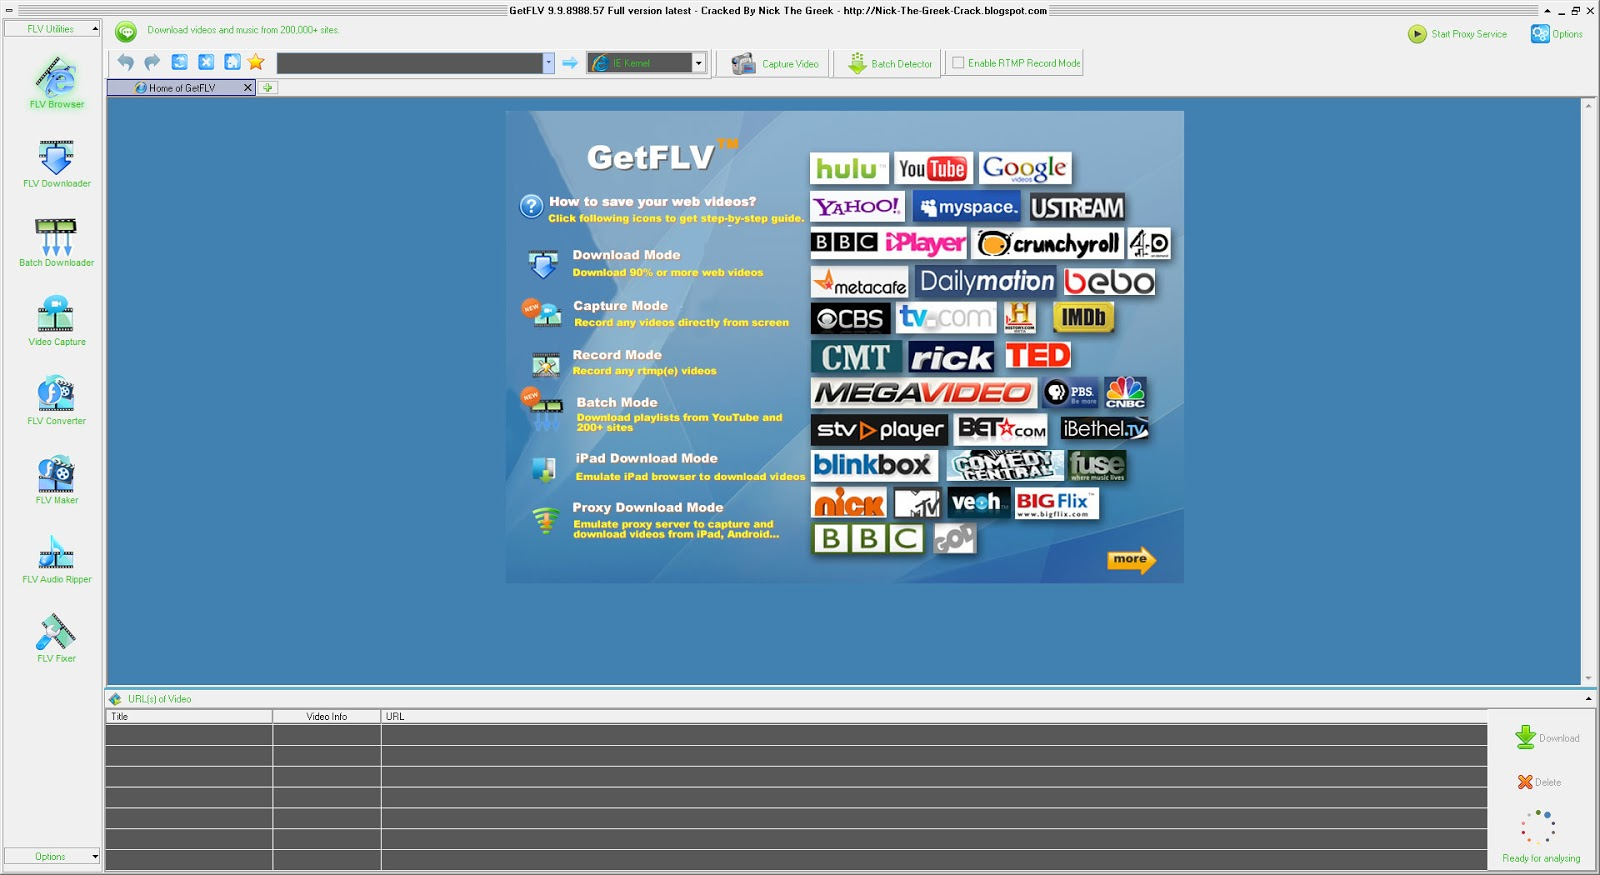 getflv register code free